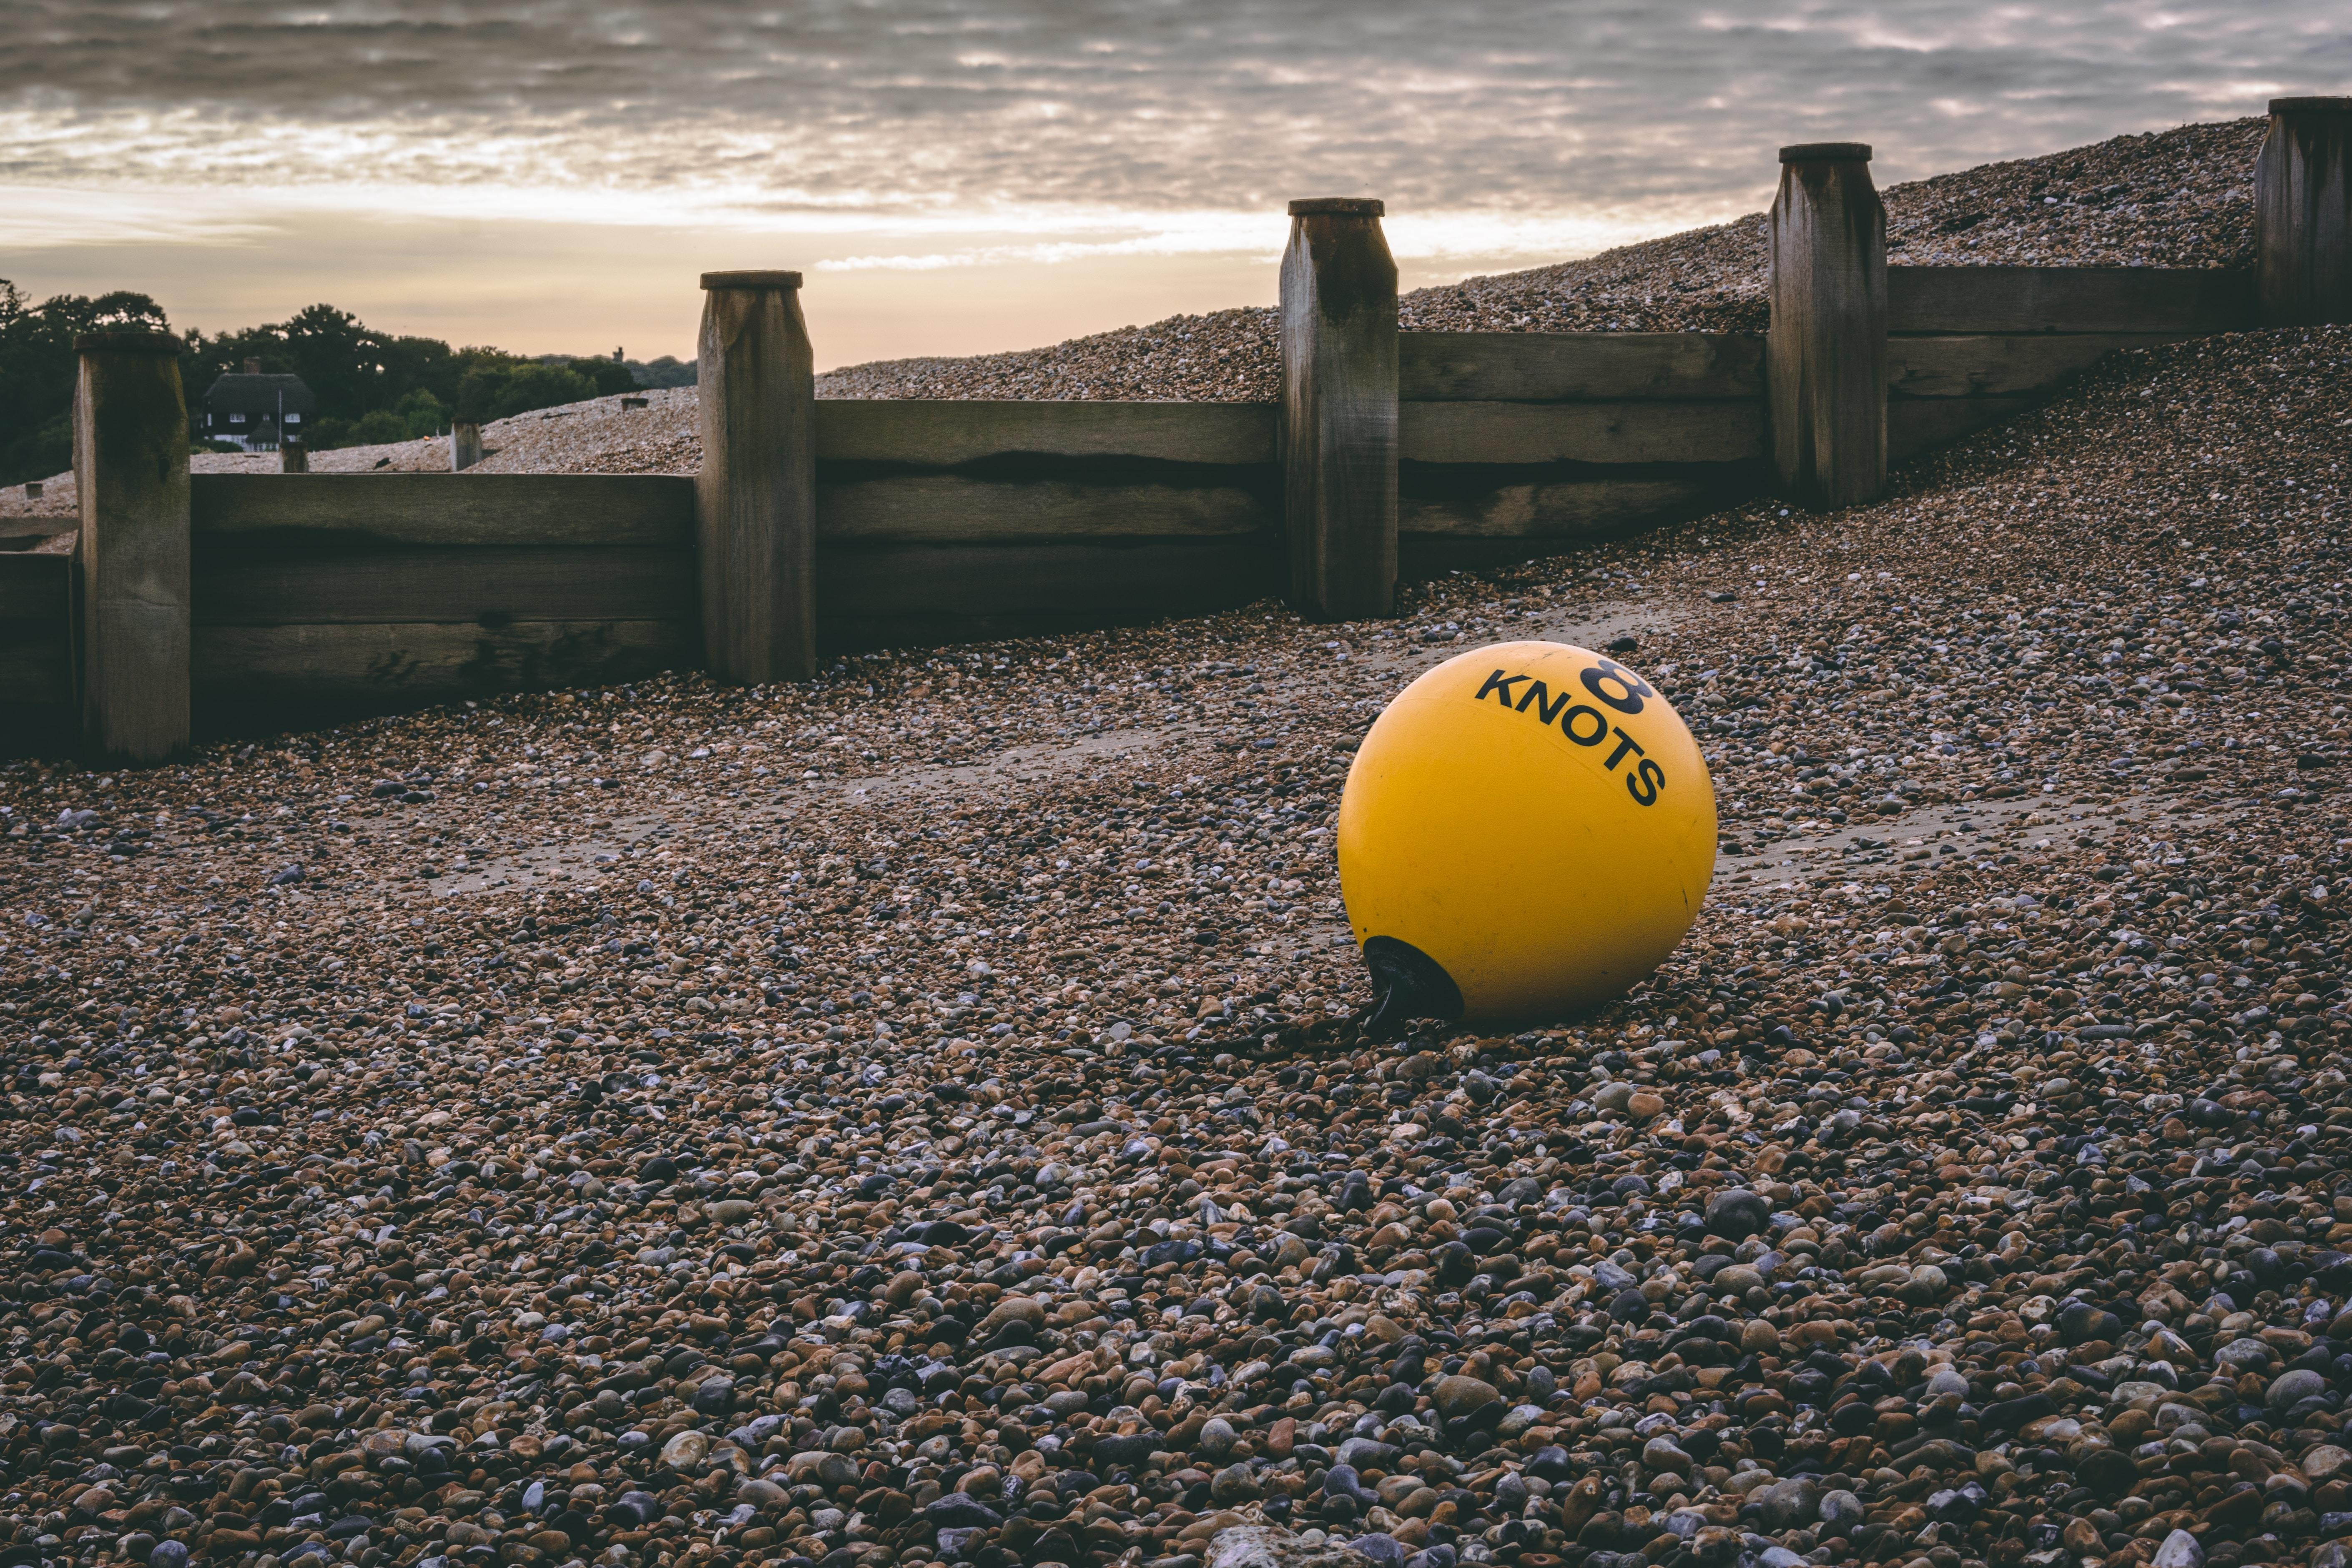 yellow 8 knots ball on pebble